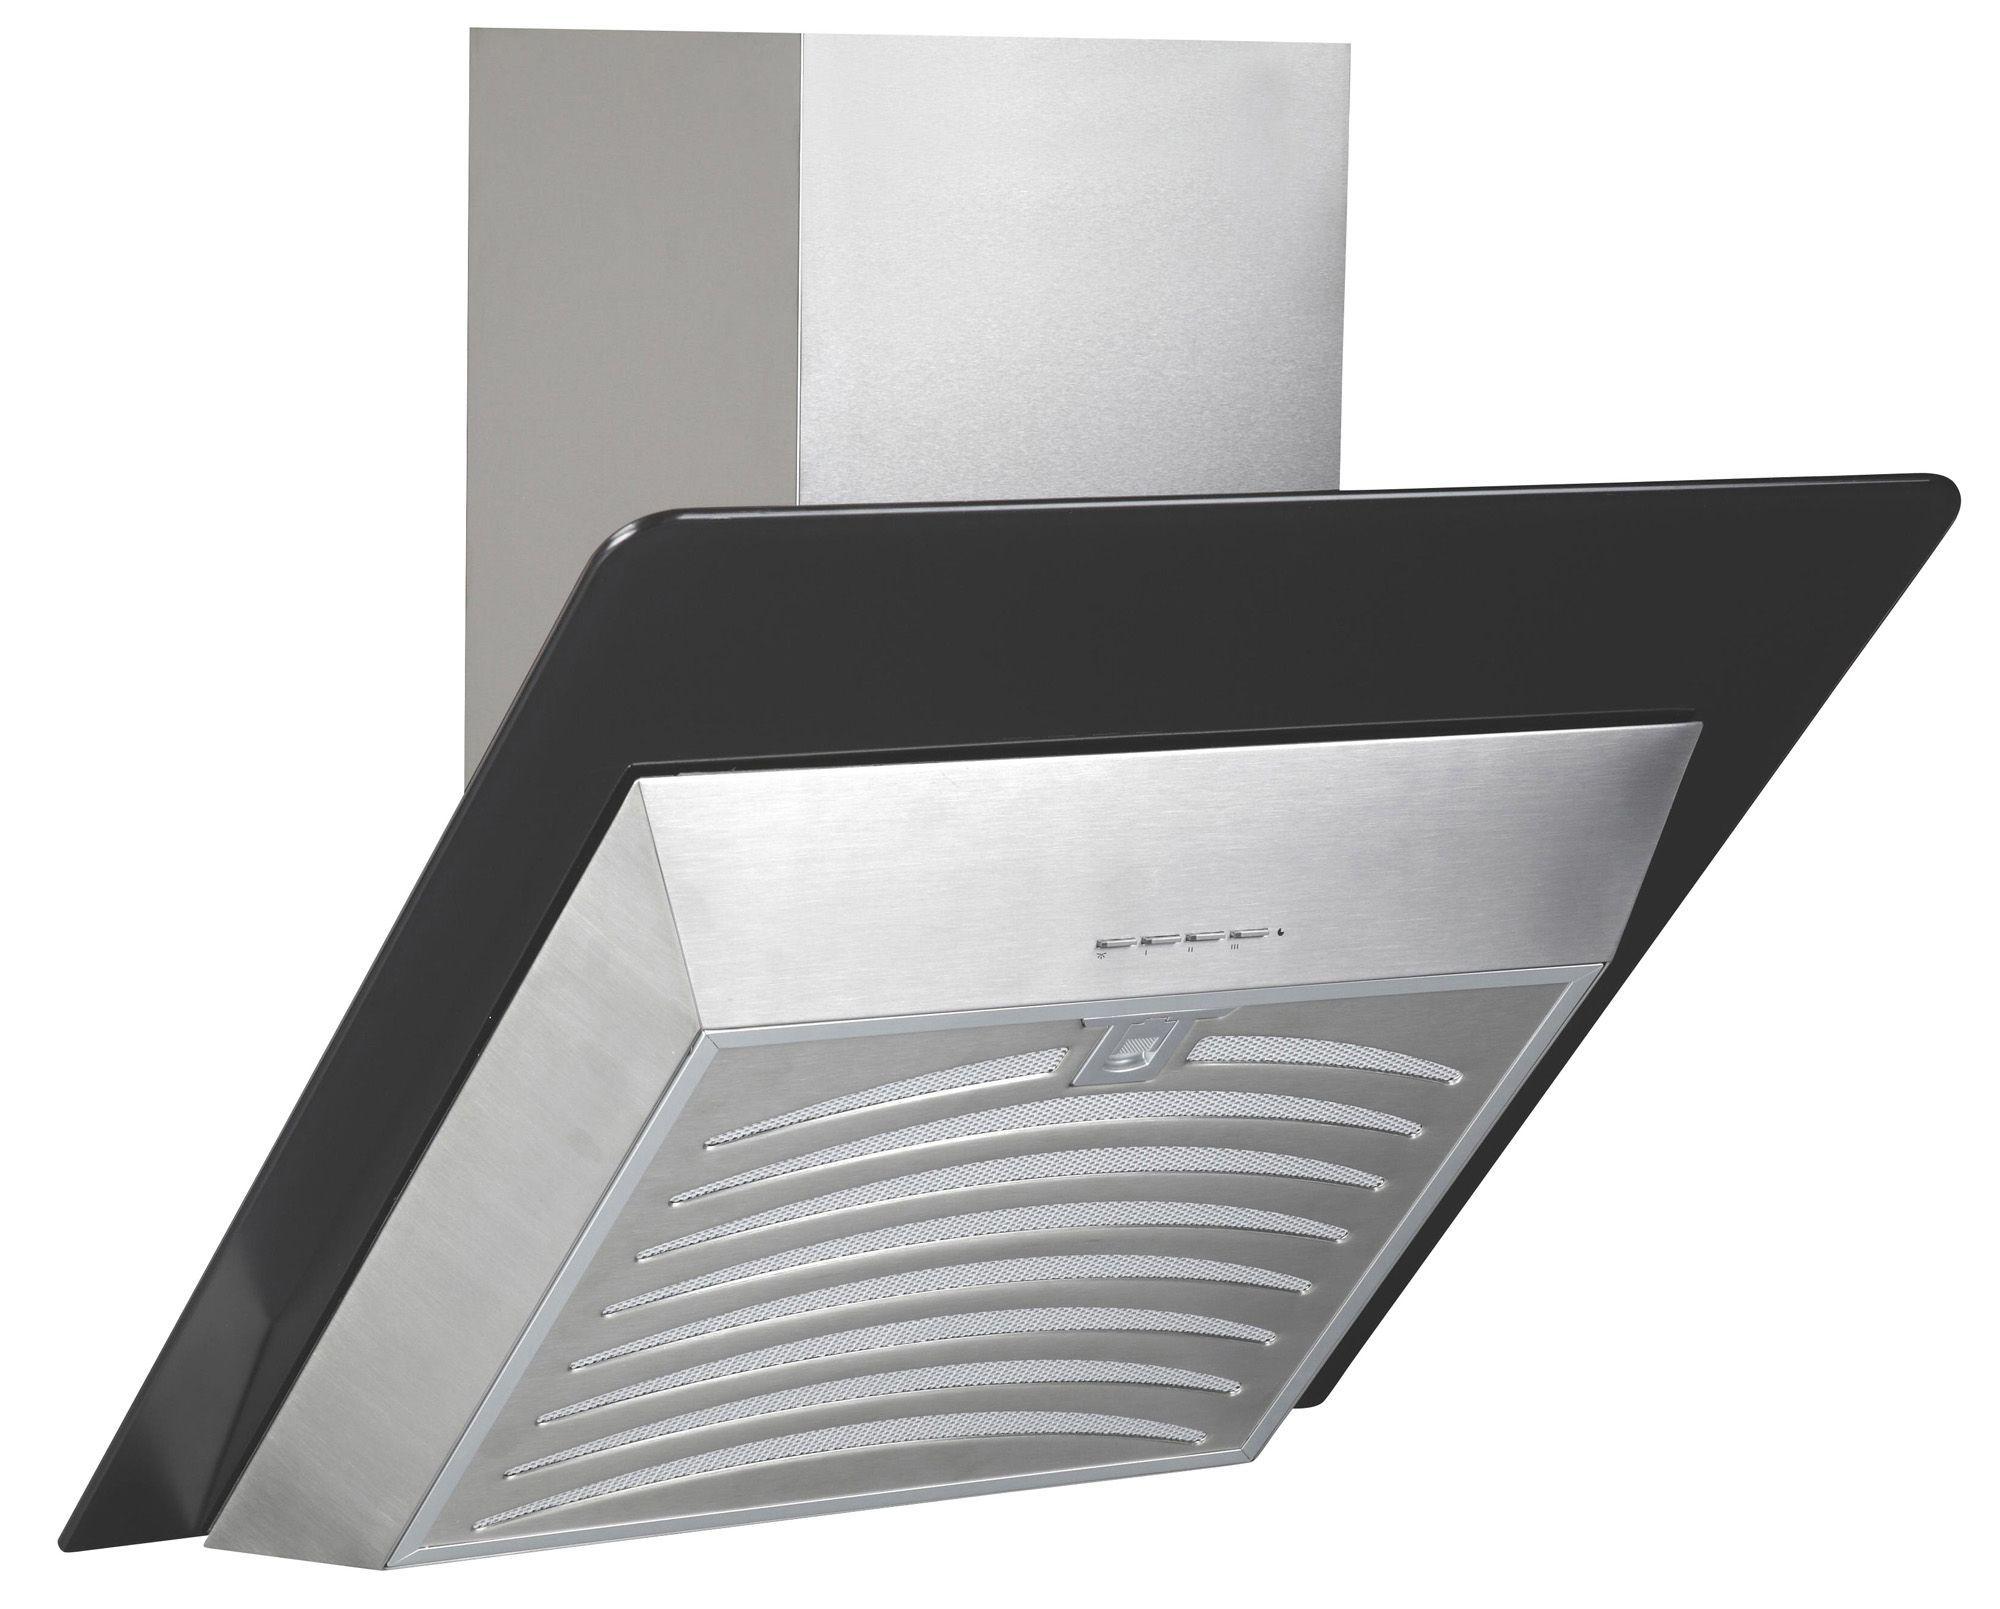 designair ags60bk black steel glass angled cooker hood. Black Bedroom Furniture Sets. Home Design Ideas